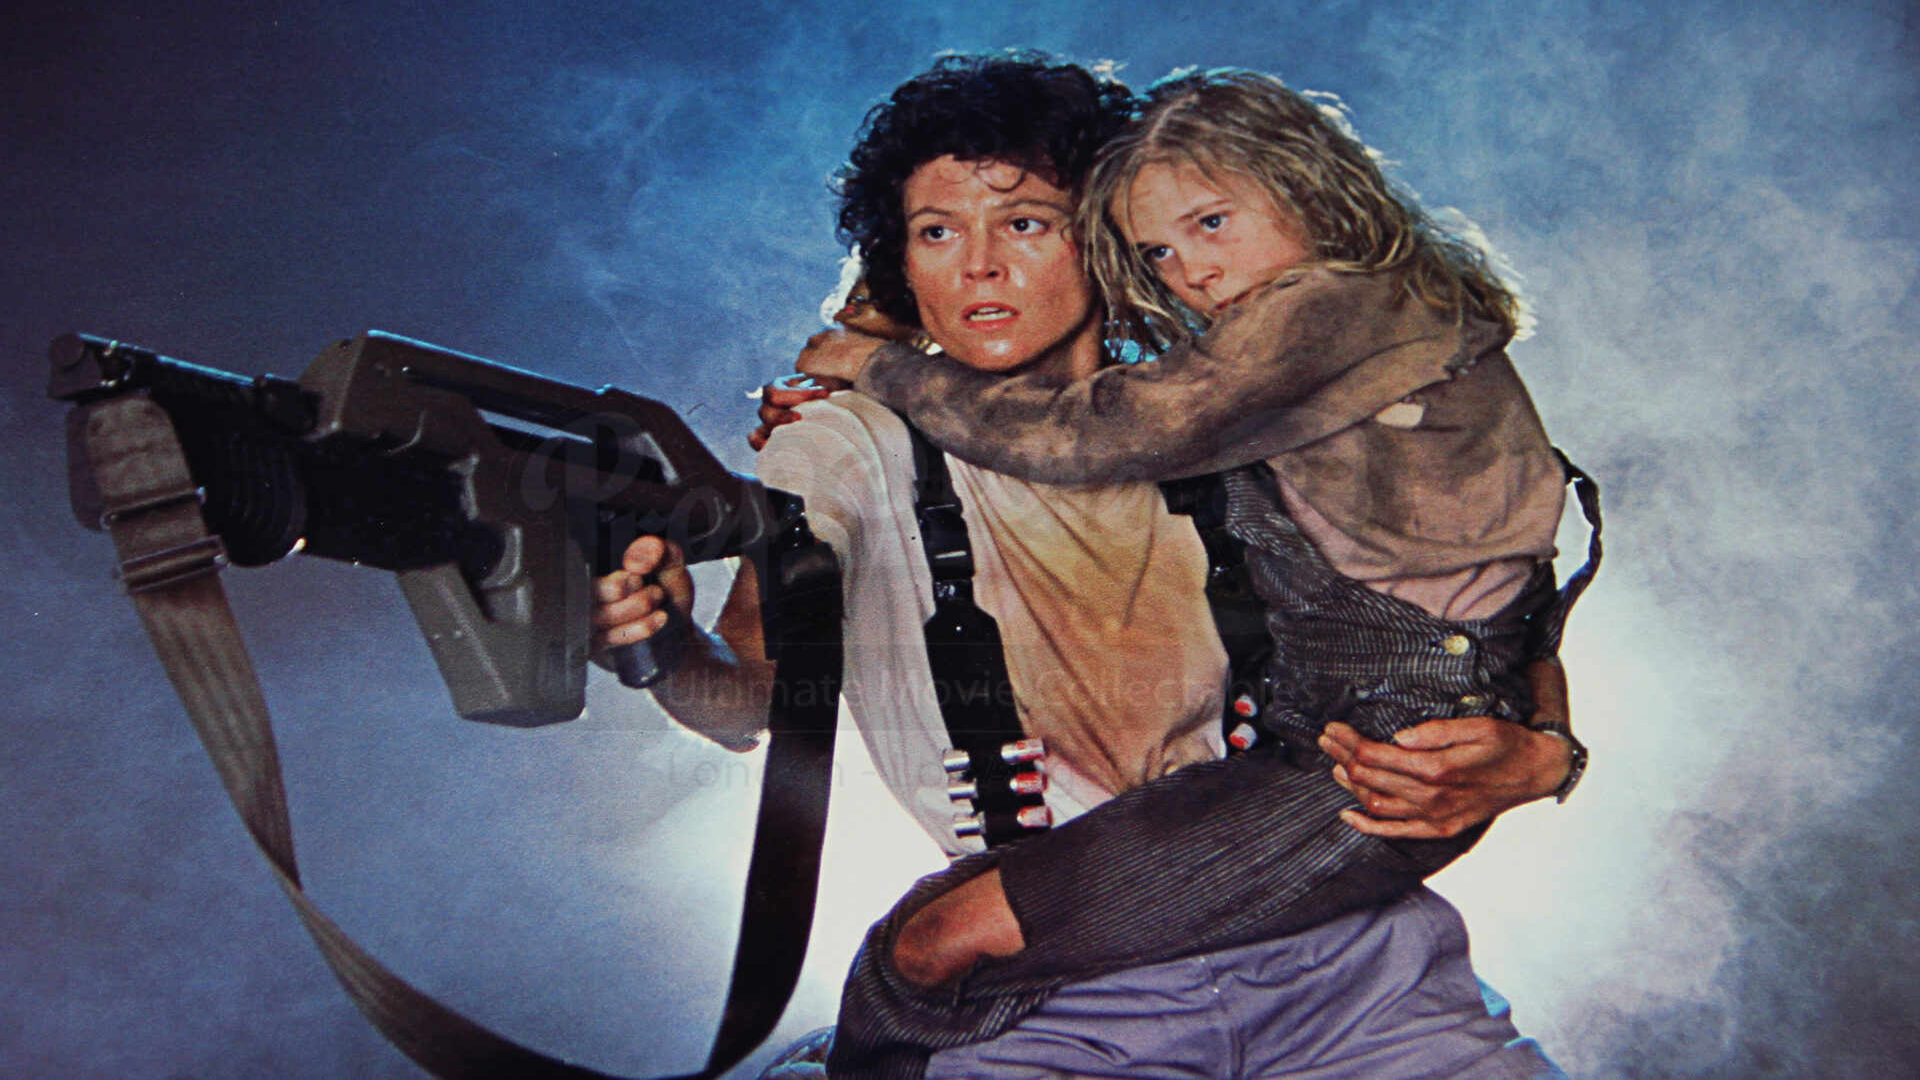 Sigourney-Weaver-Aliens-ellen-ripley-and-newt